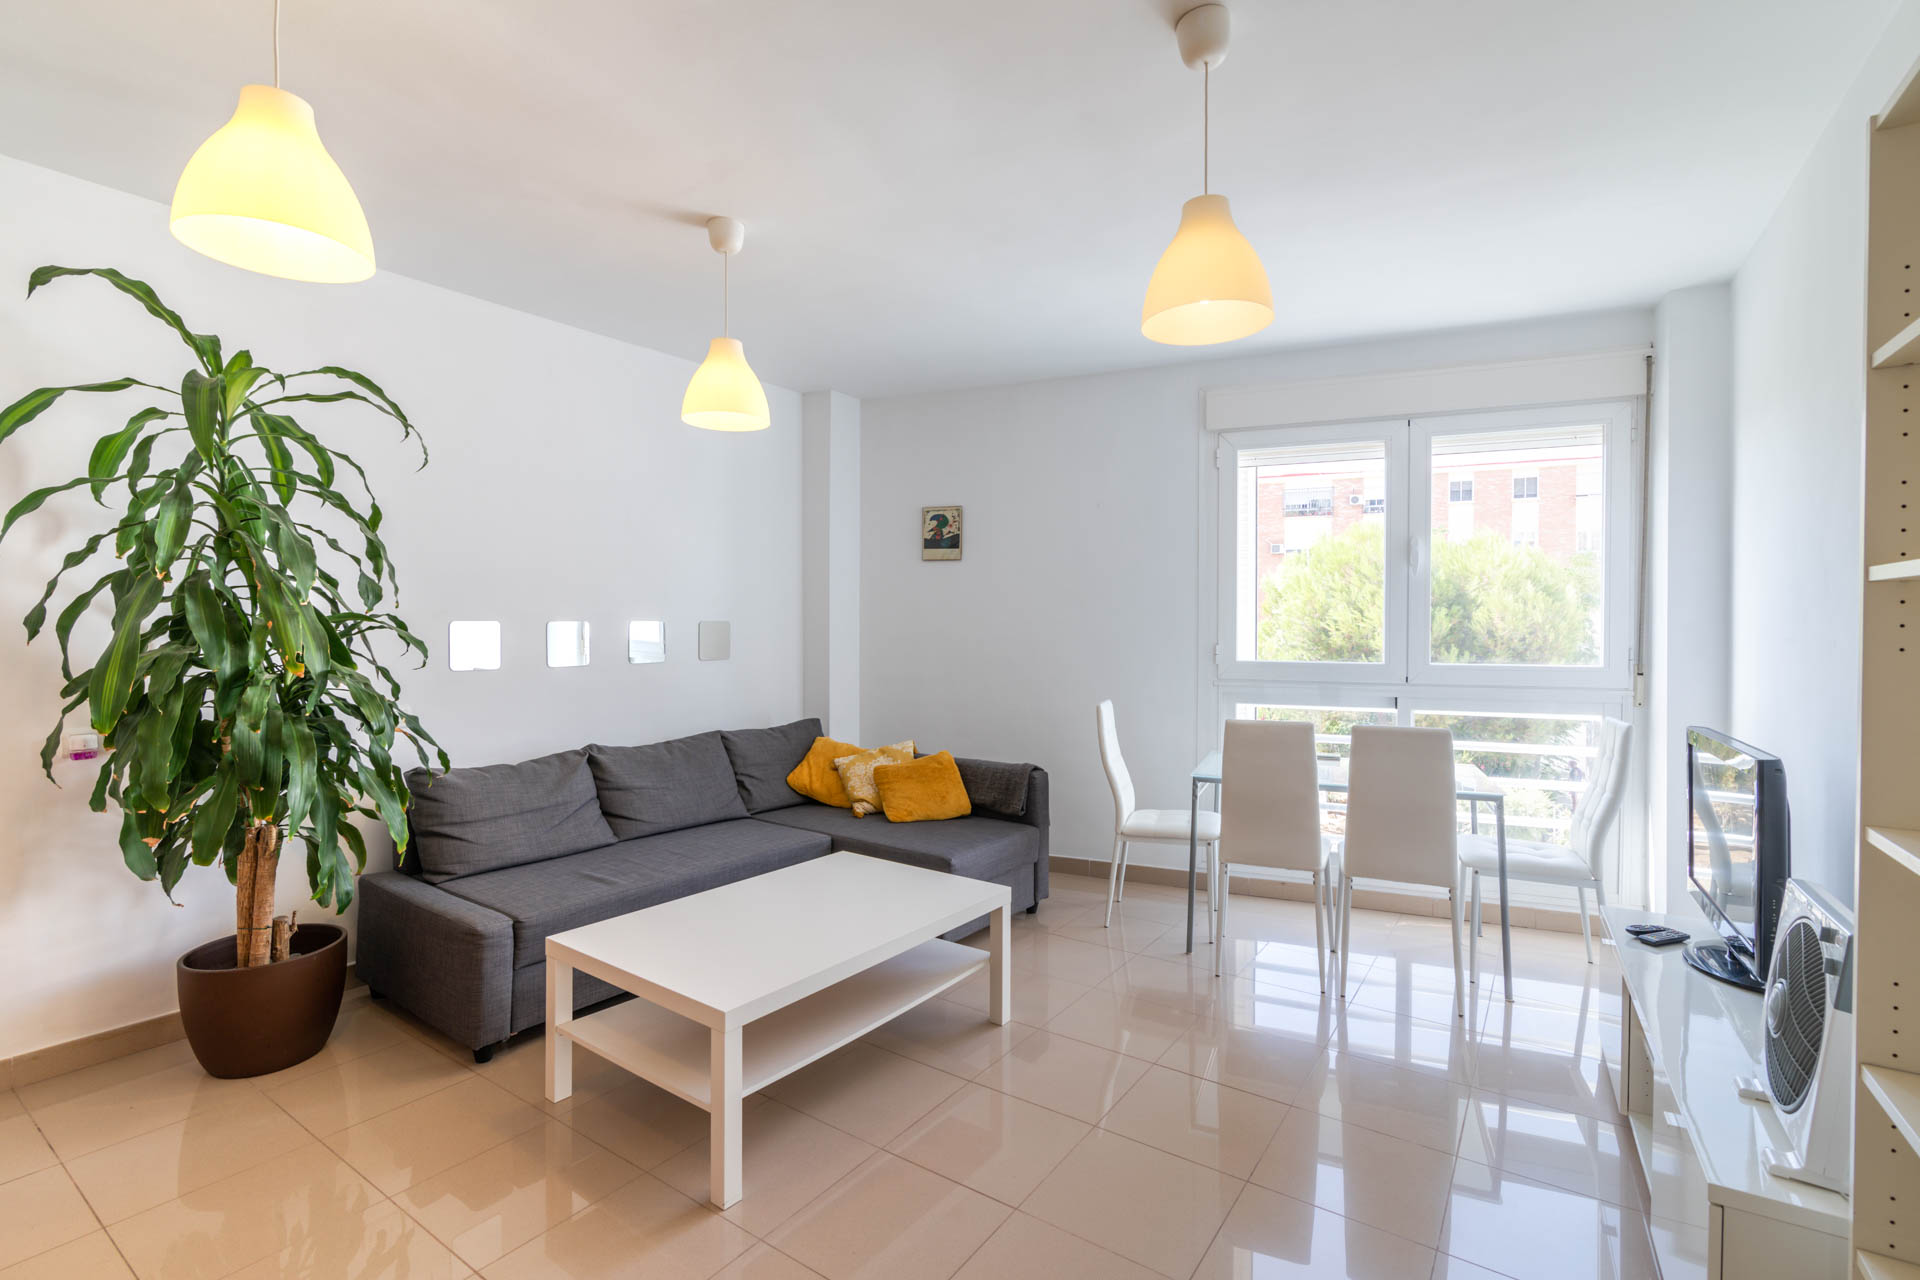 apartamento-clavel-salon-4